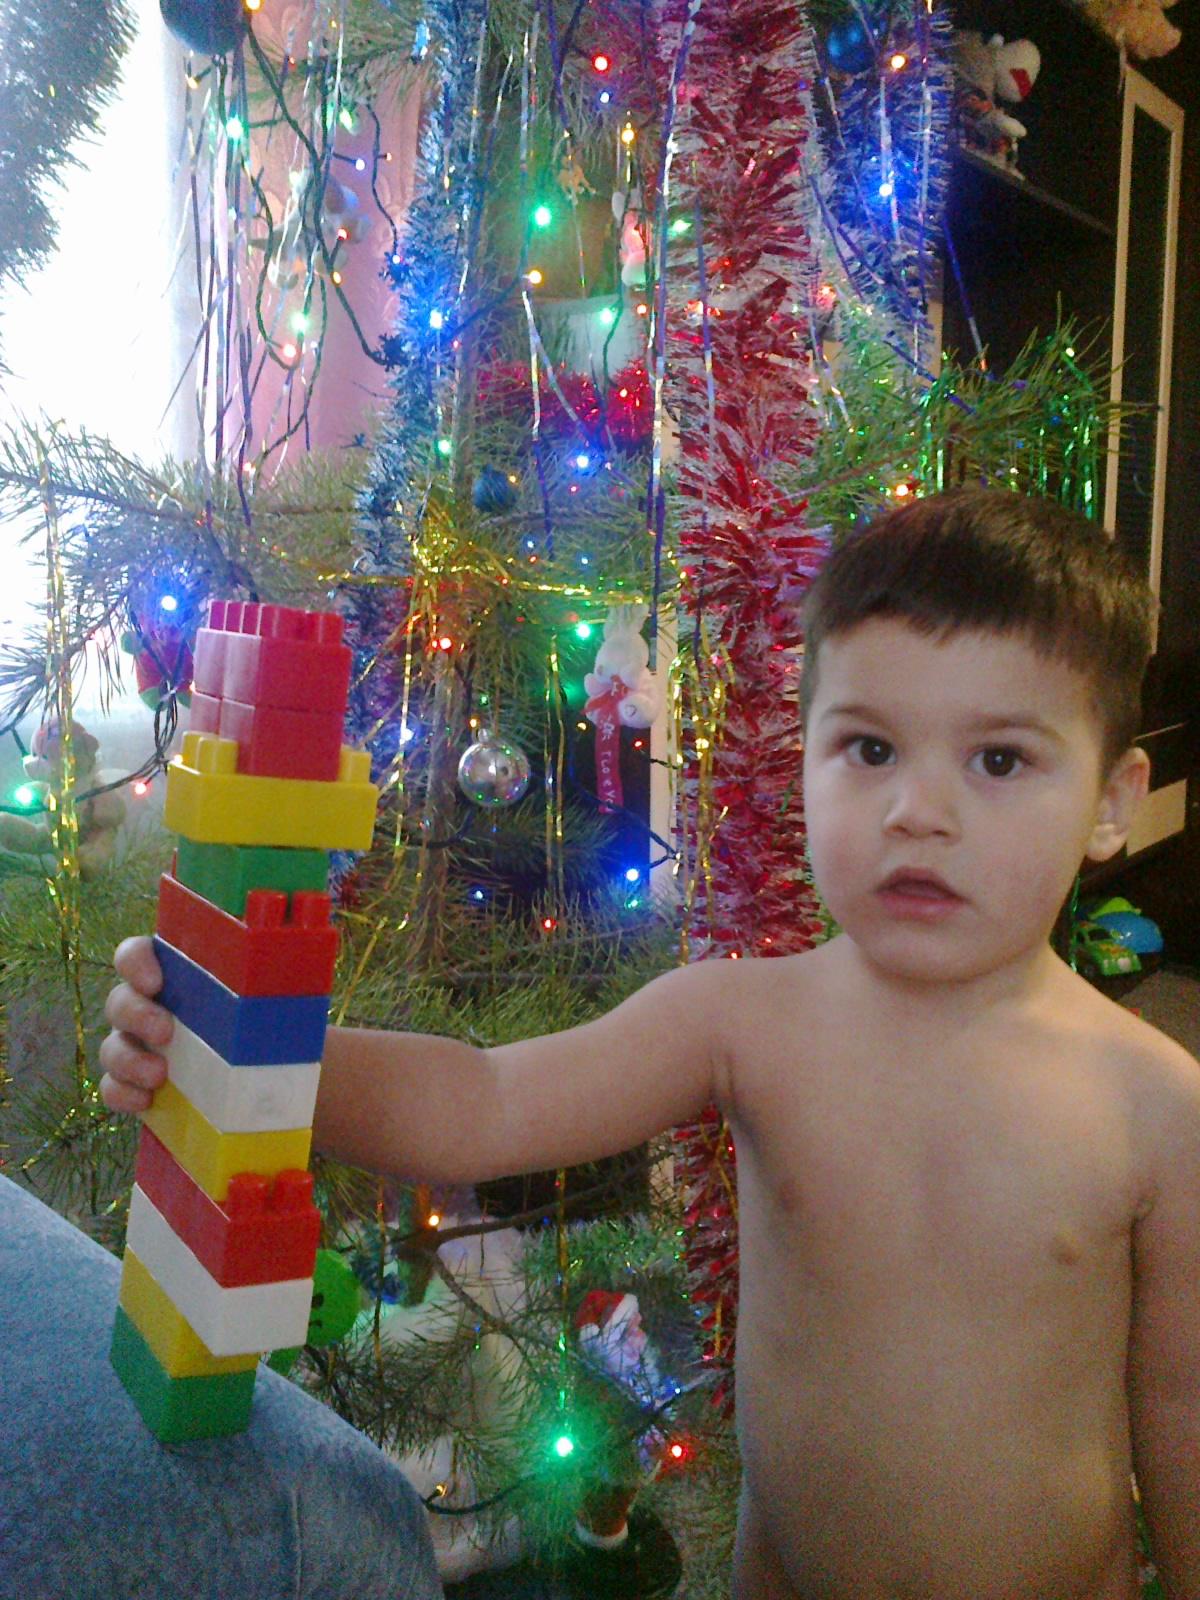 ЕЛОЧКА СЫНОК И LEGO!!!!!. Наряди елку с LEGO